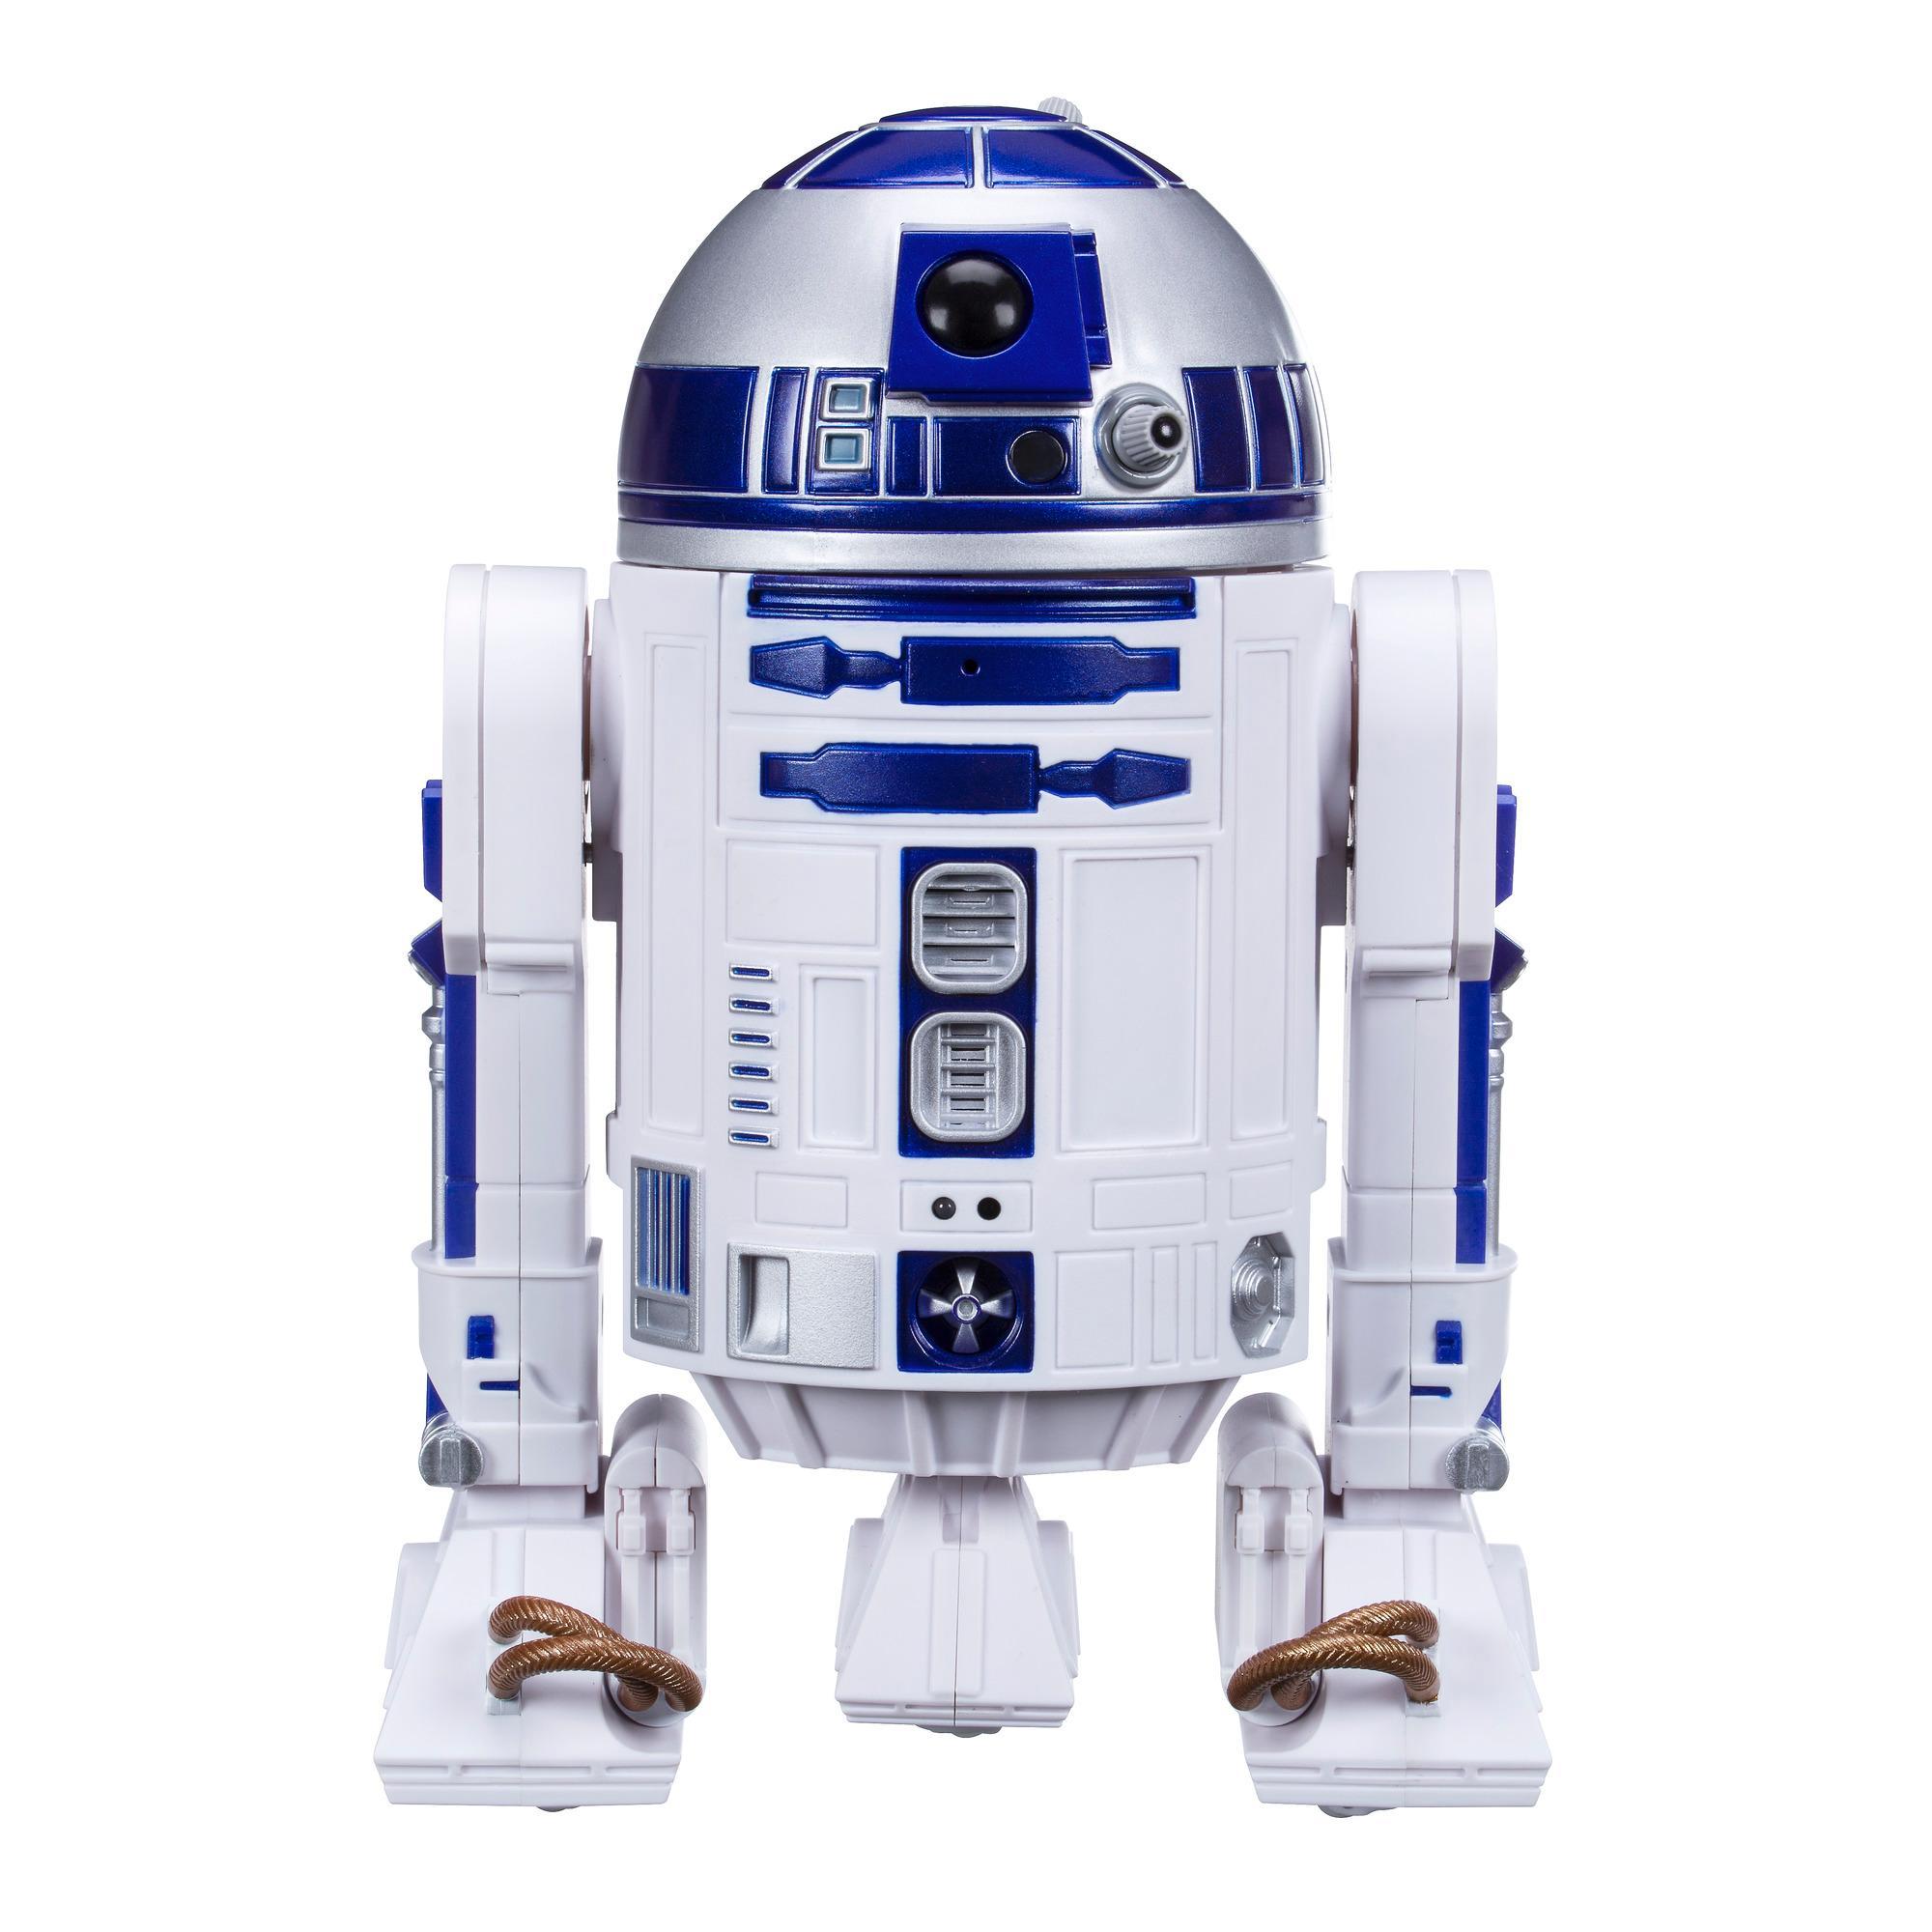 Star Wars E7 Smart R2D2